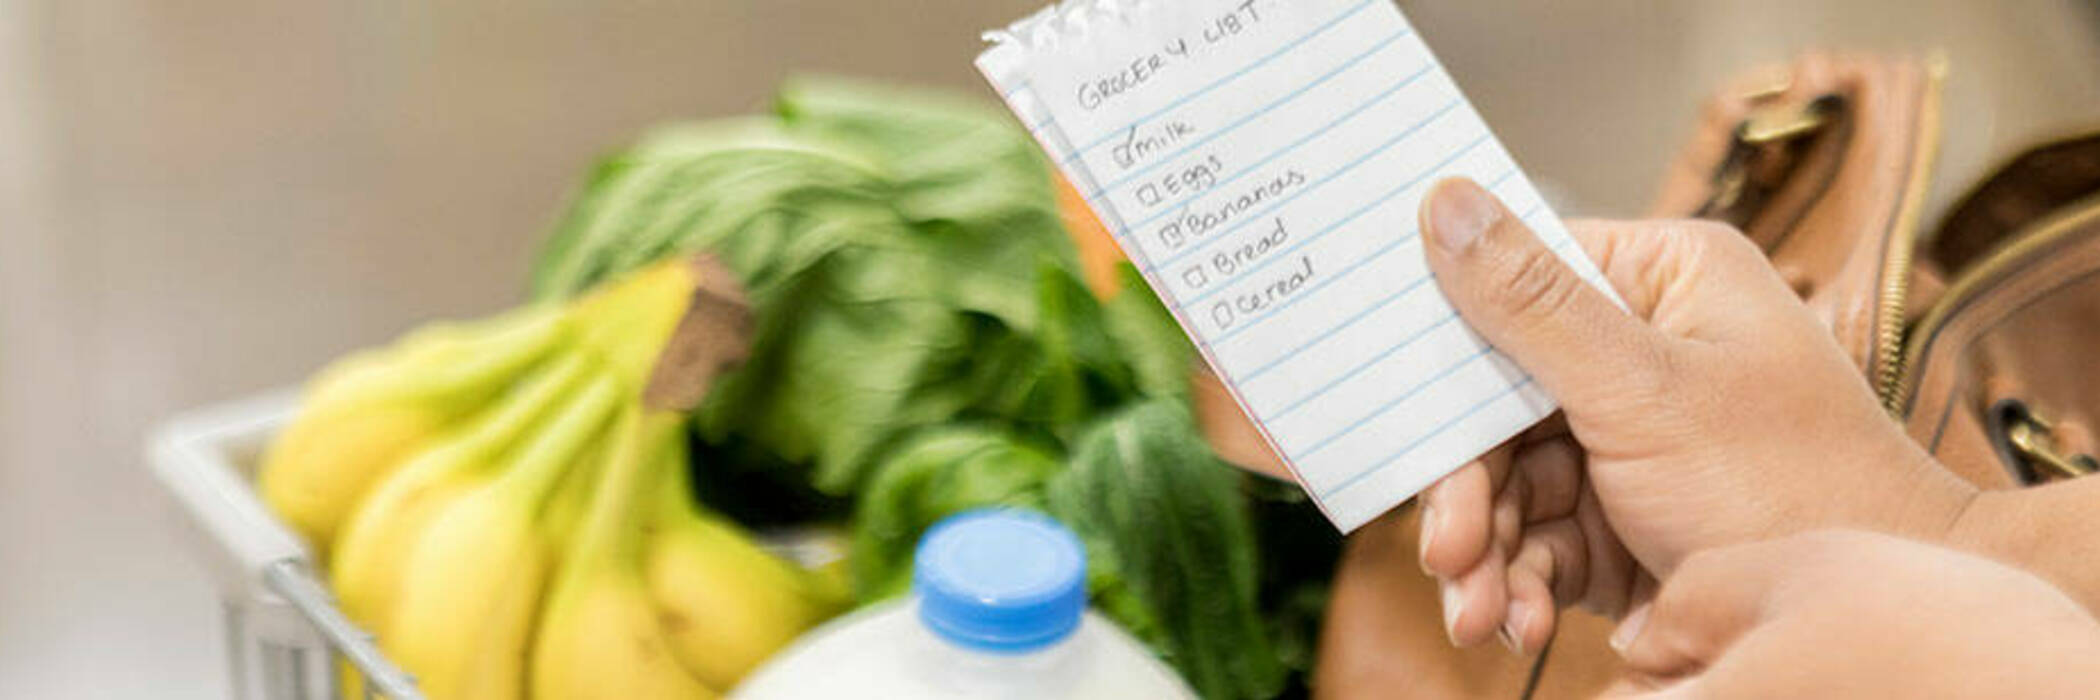 Supermarket shopper checks items off her grocery list.